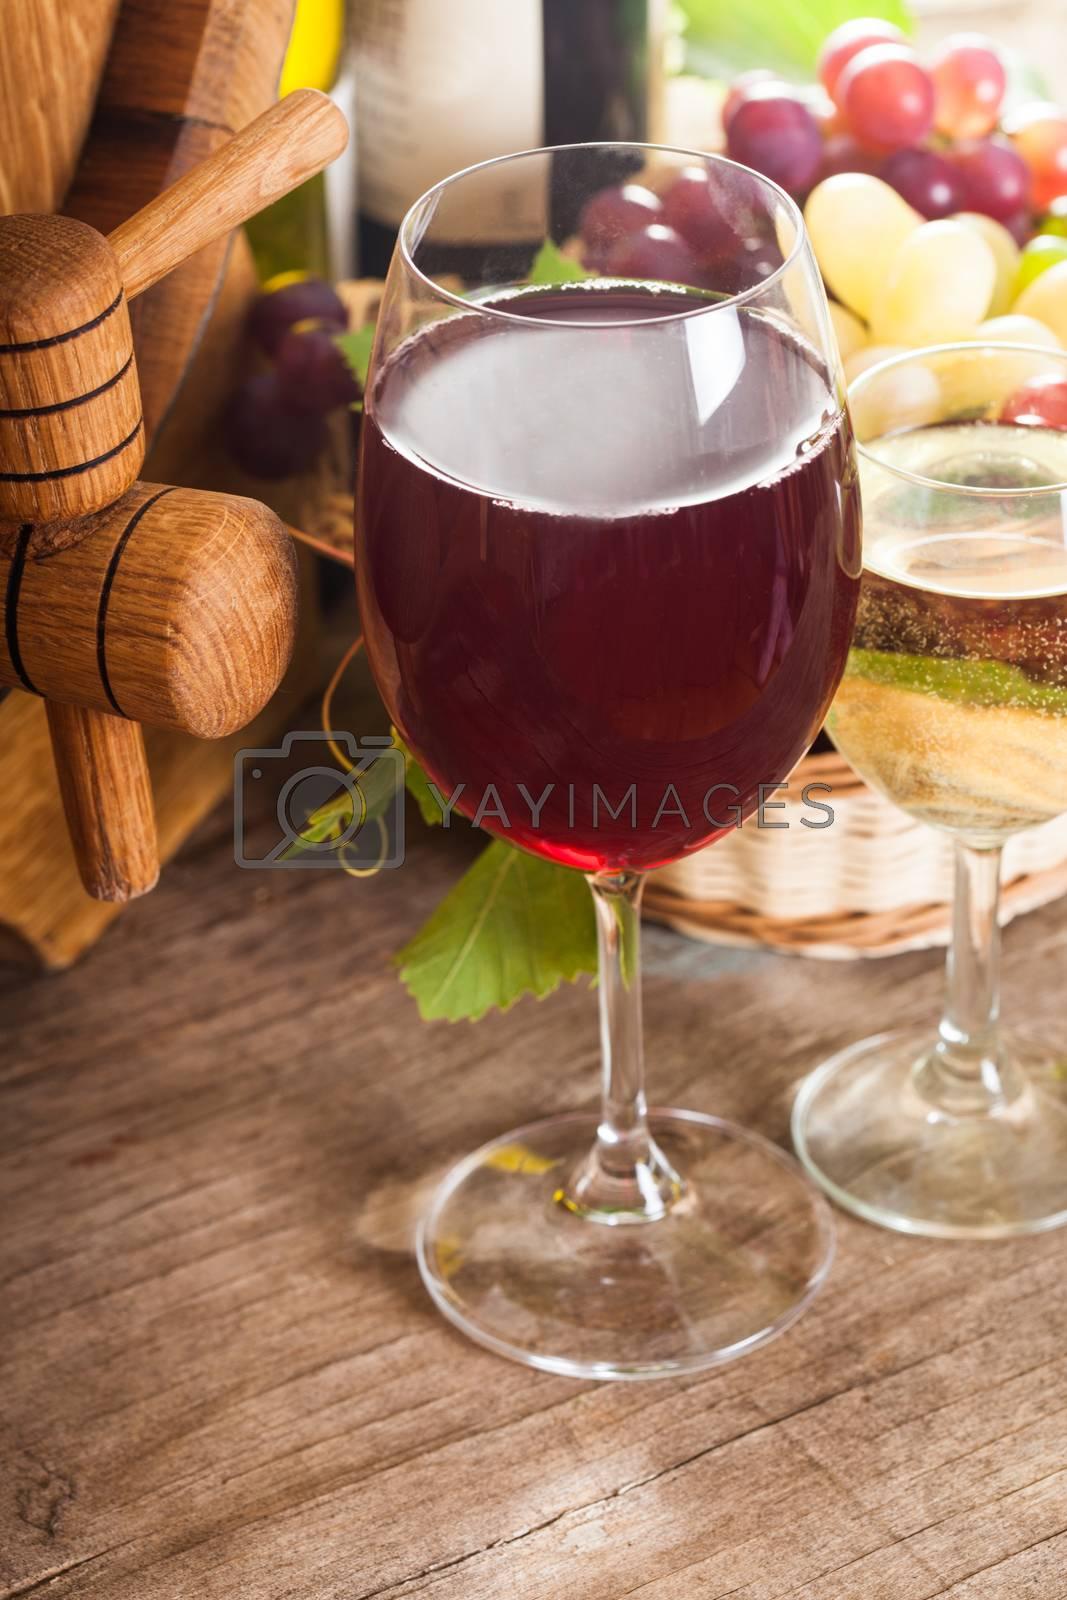 Glasses of wine on the old wooden background over oak barrel